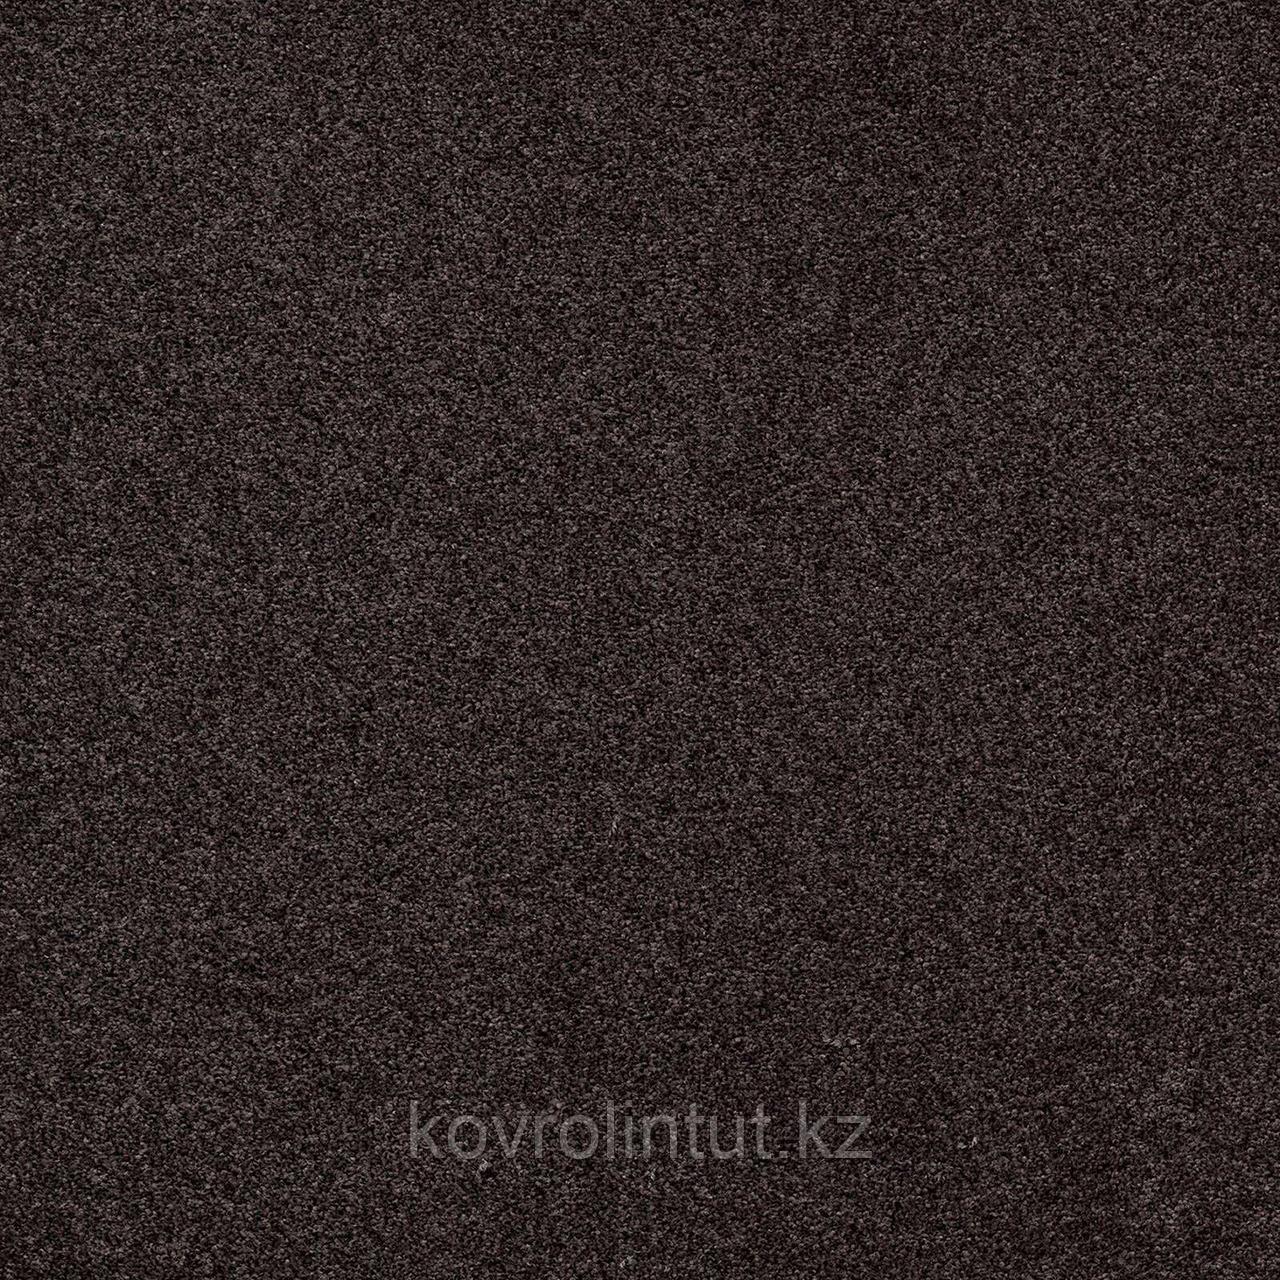 Плитка ковровая Modulyss, Gleam 866, 50х50